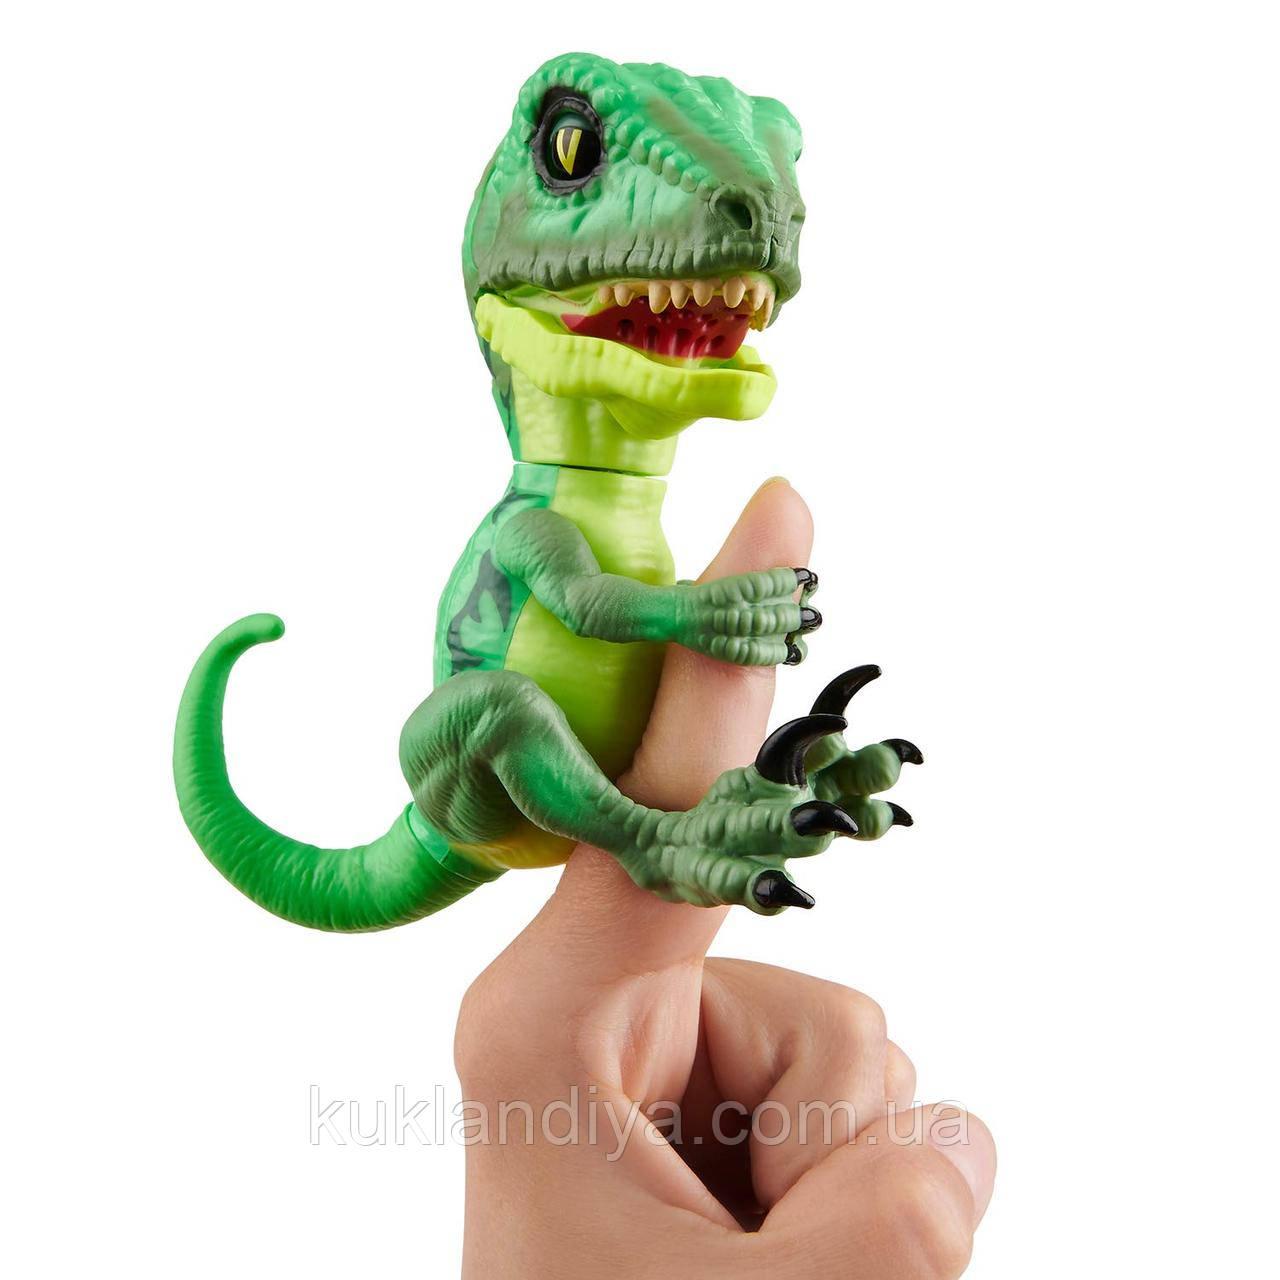 Інтерактивний ручної динозавр Raptor Untamed WowWee by Fingerlings (3782)